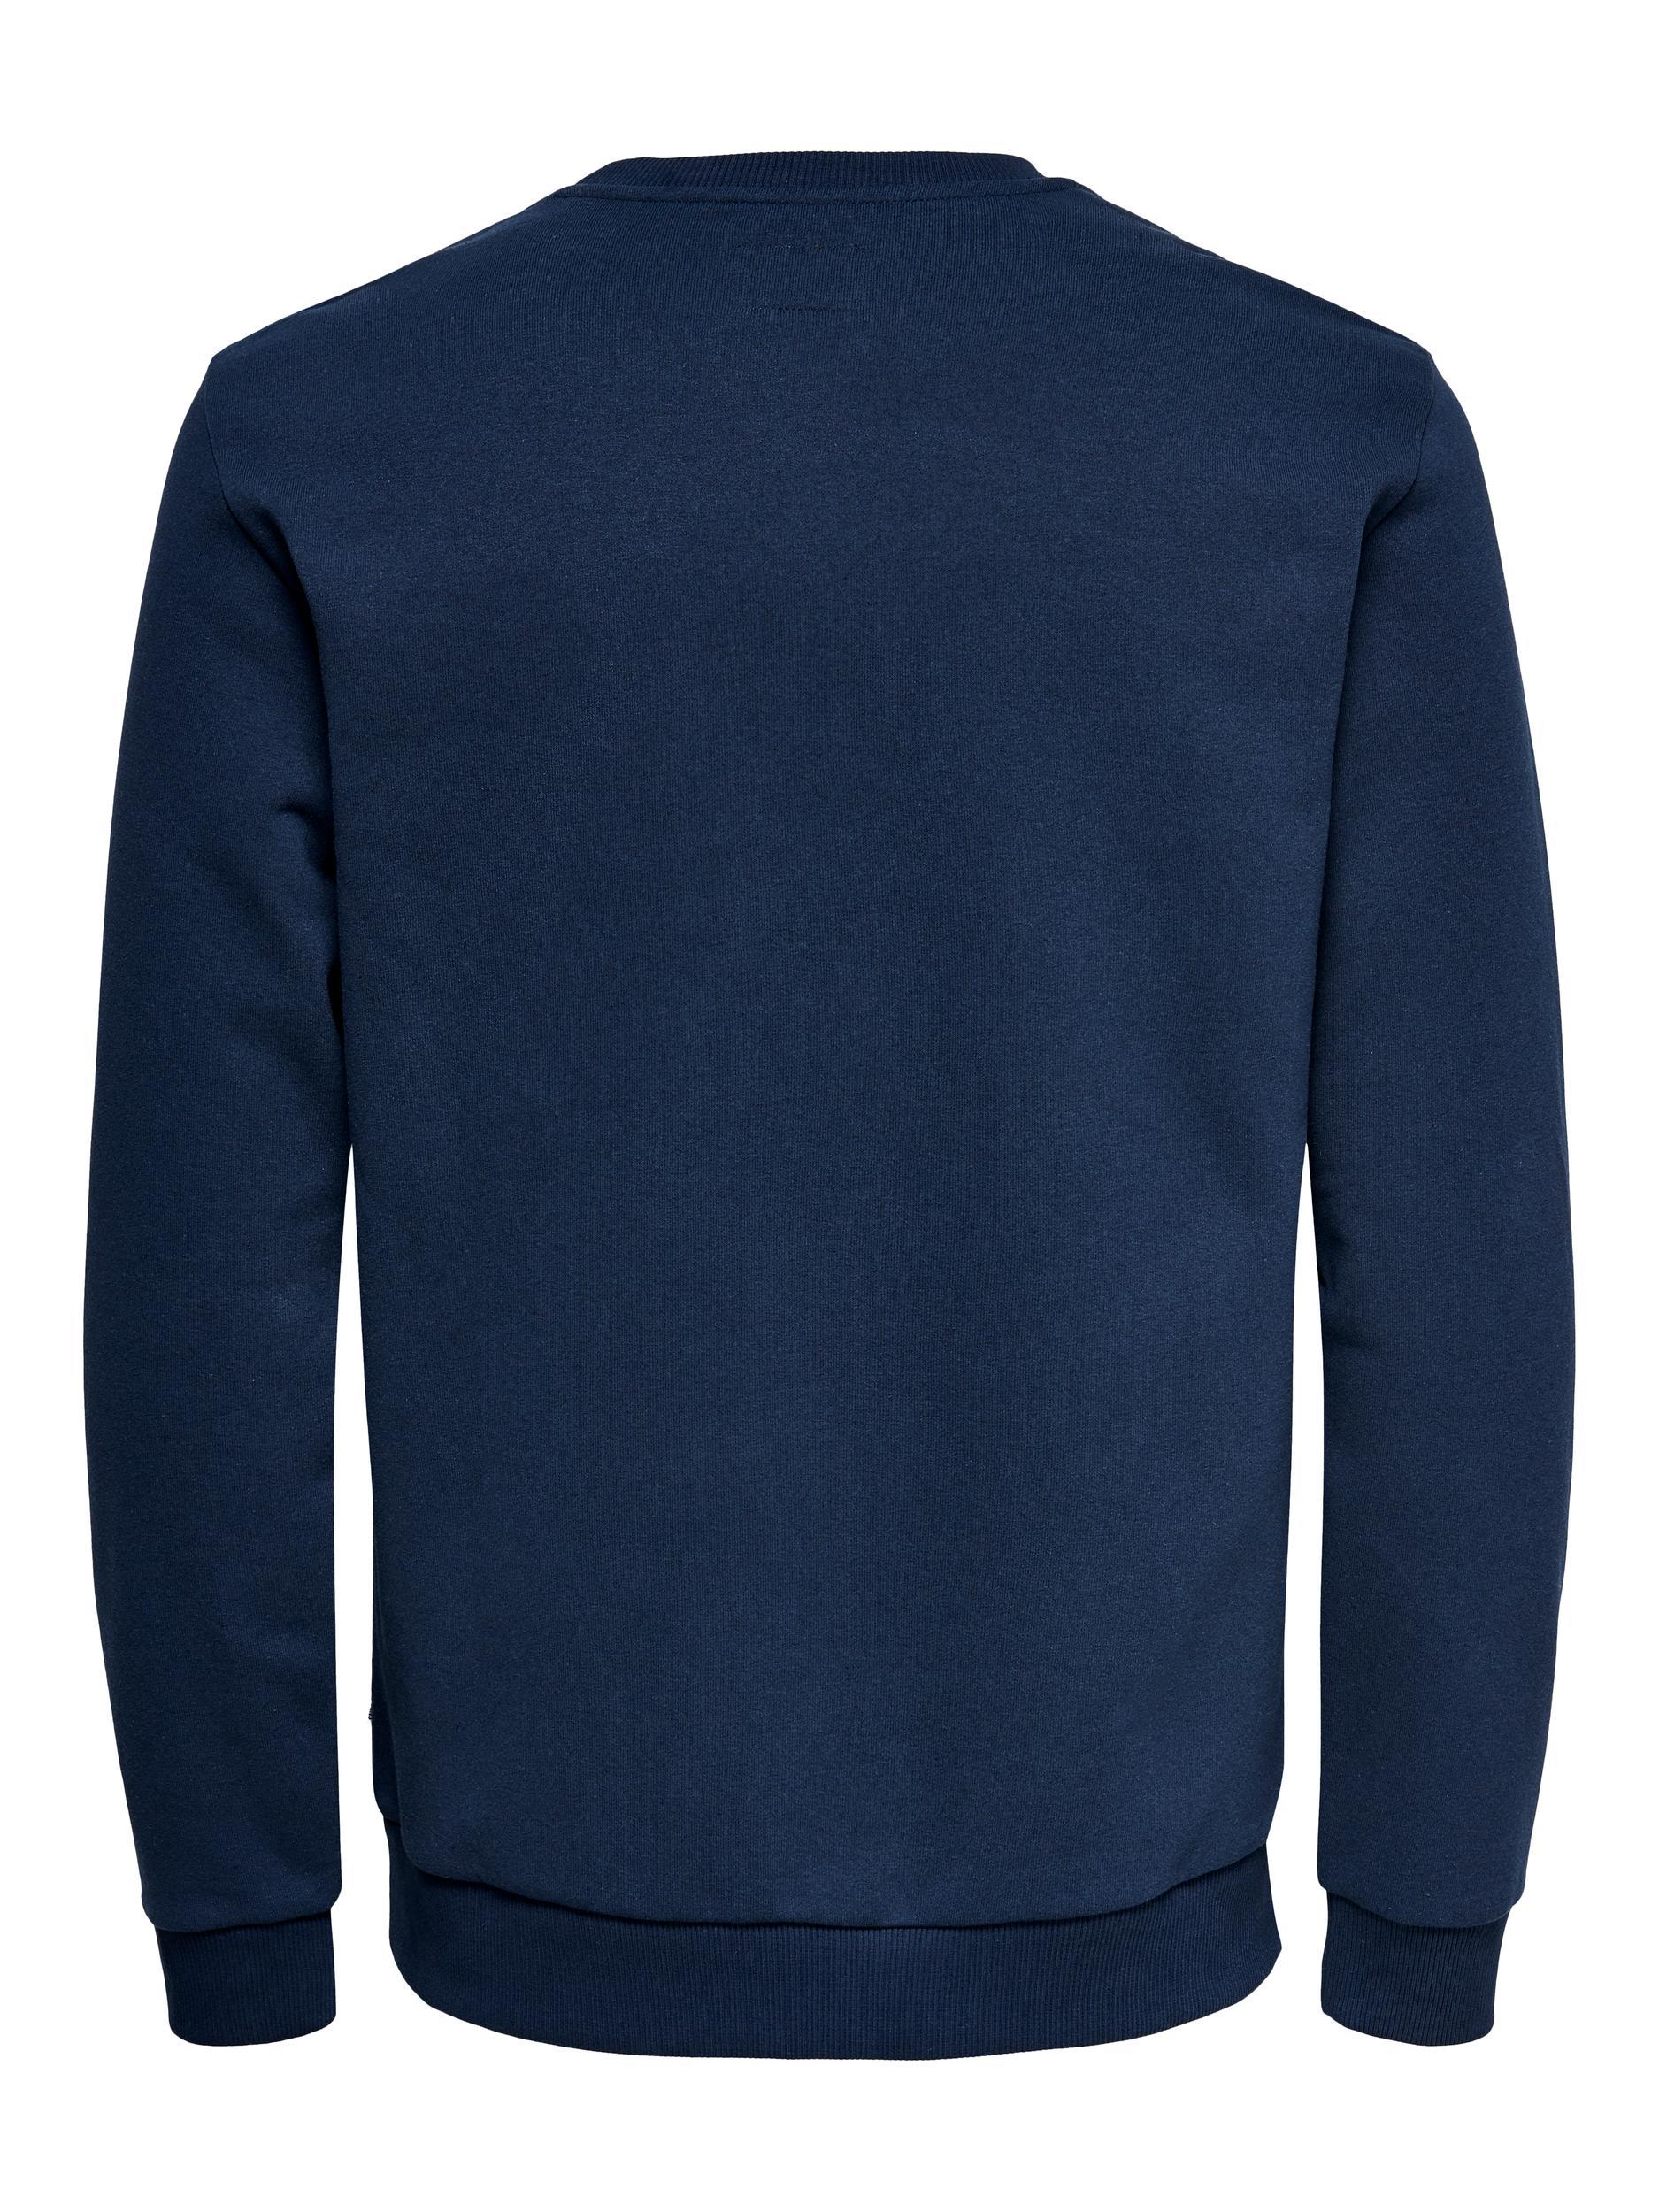 Only & Sons Ceres Life Crew Neck sweatshirt, dress blues, medium